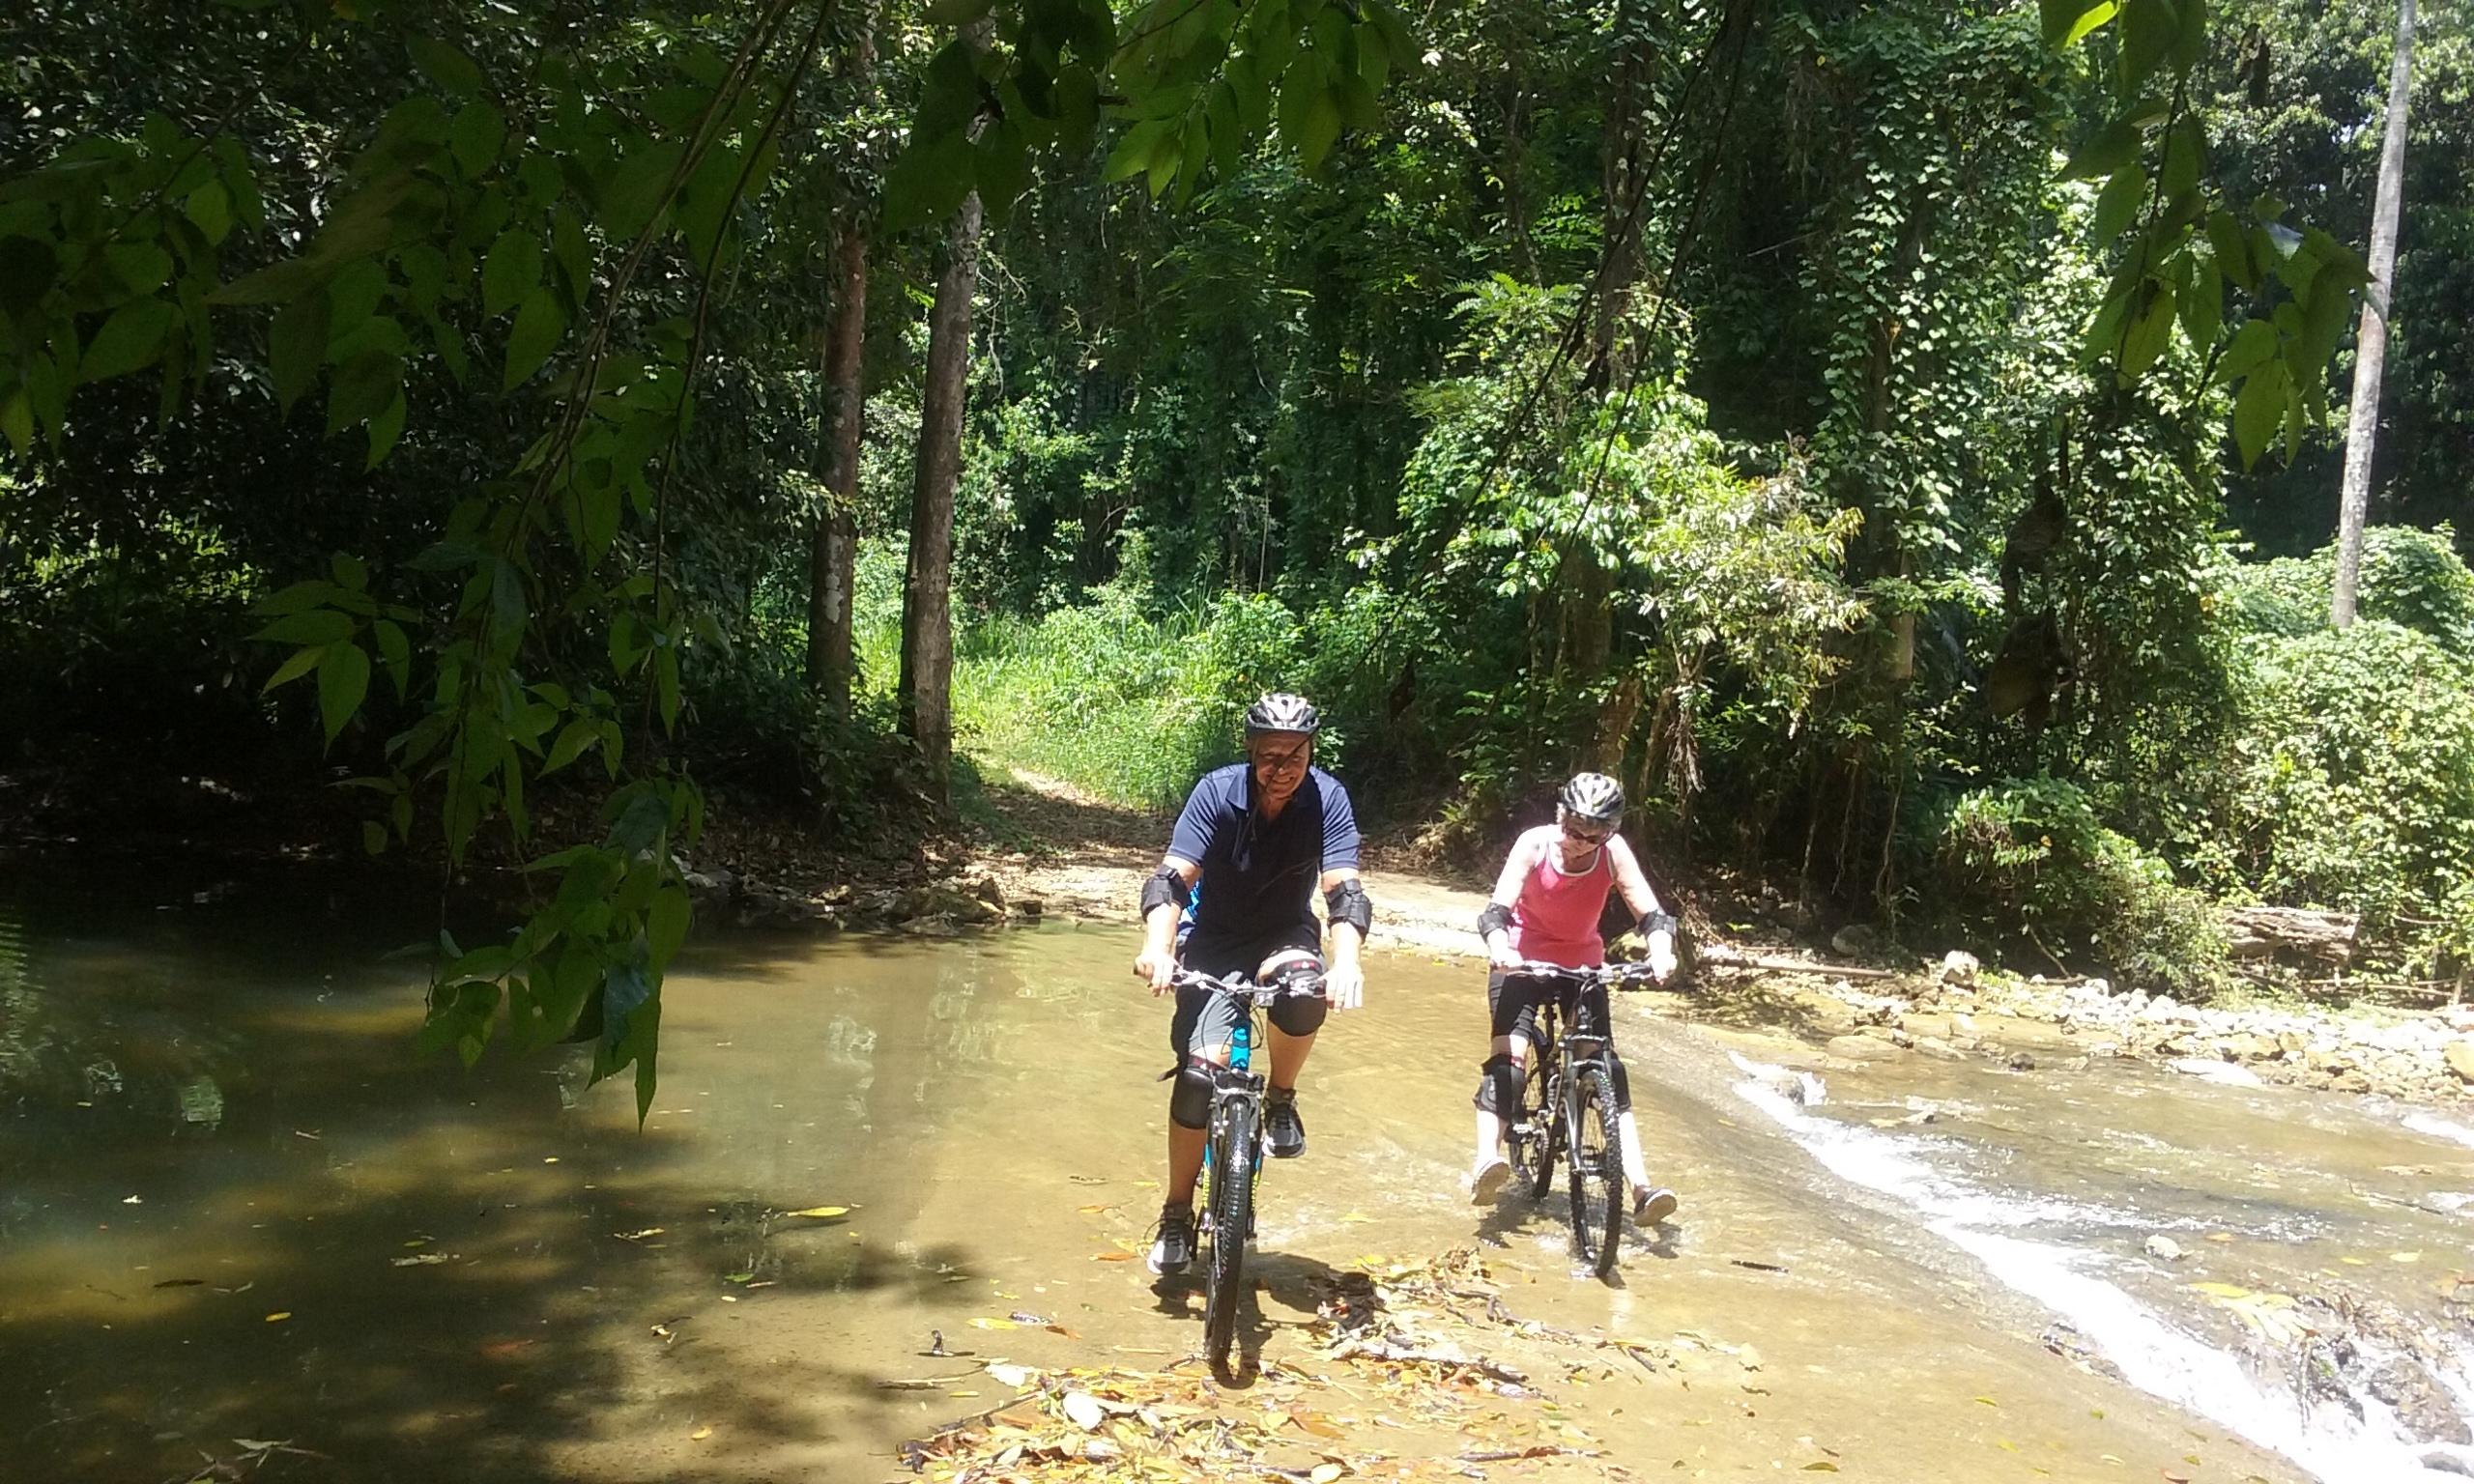 Mountain biking in Jamaica